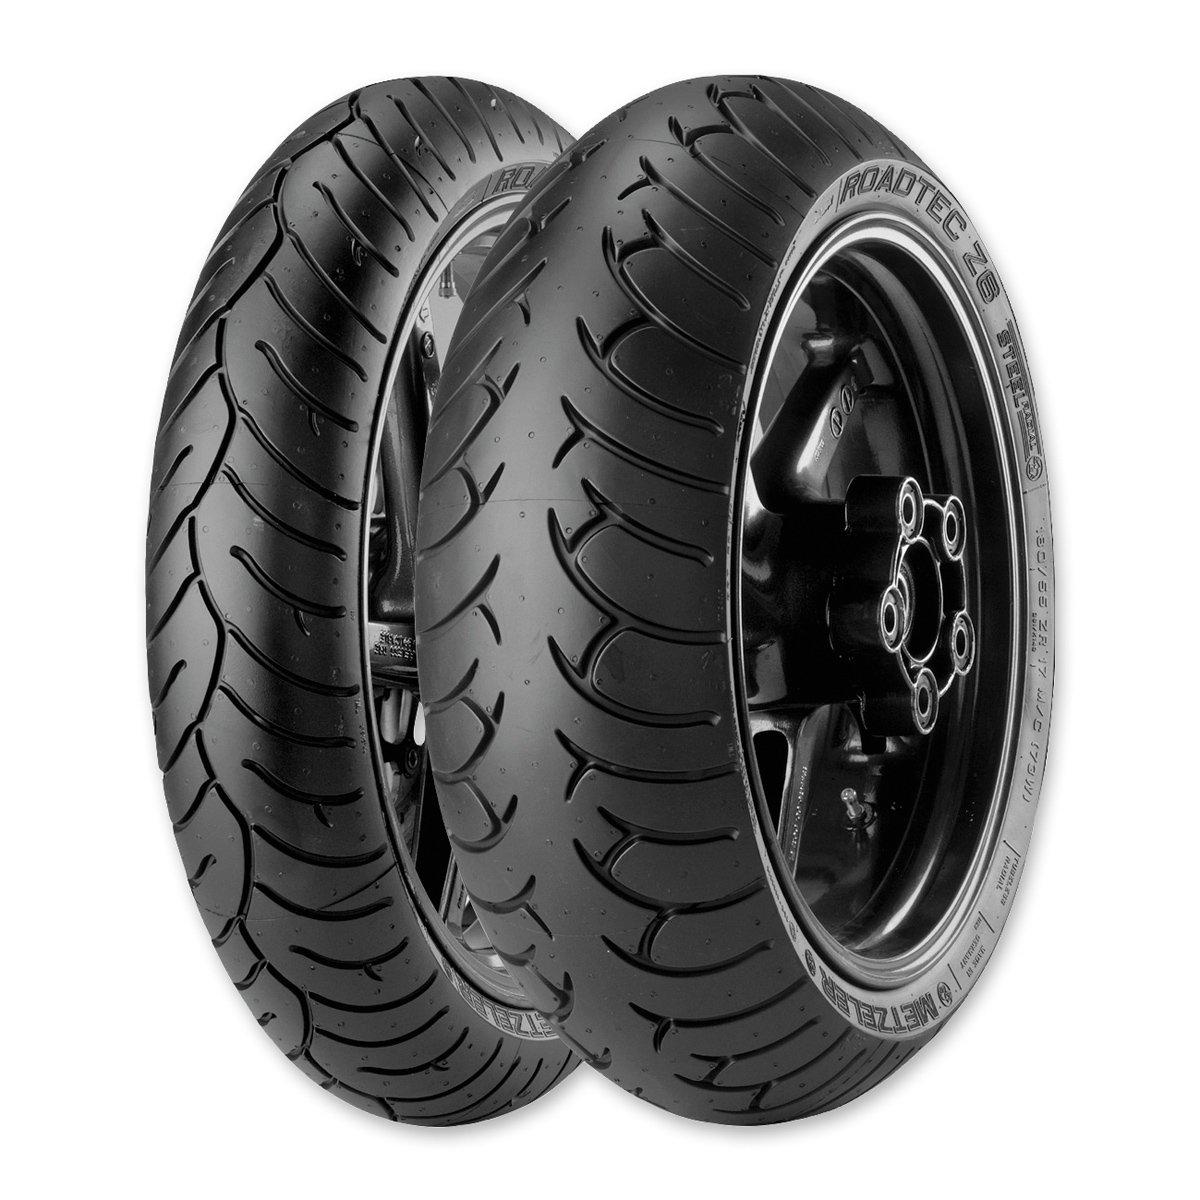 Pirelli Diablo Front Motorcycle Tires - 120/70ZR-17 1430700